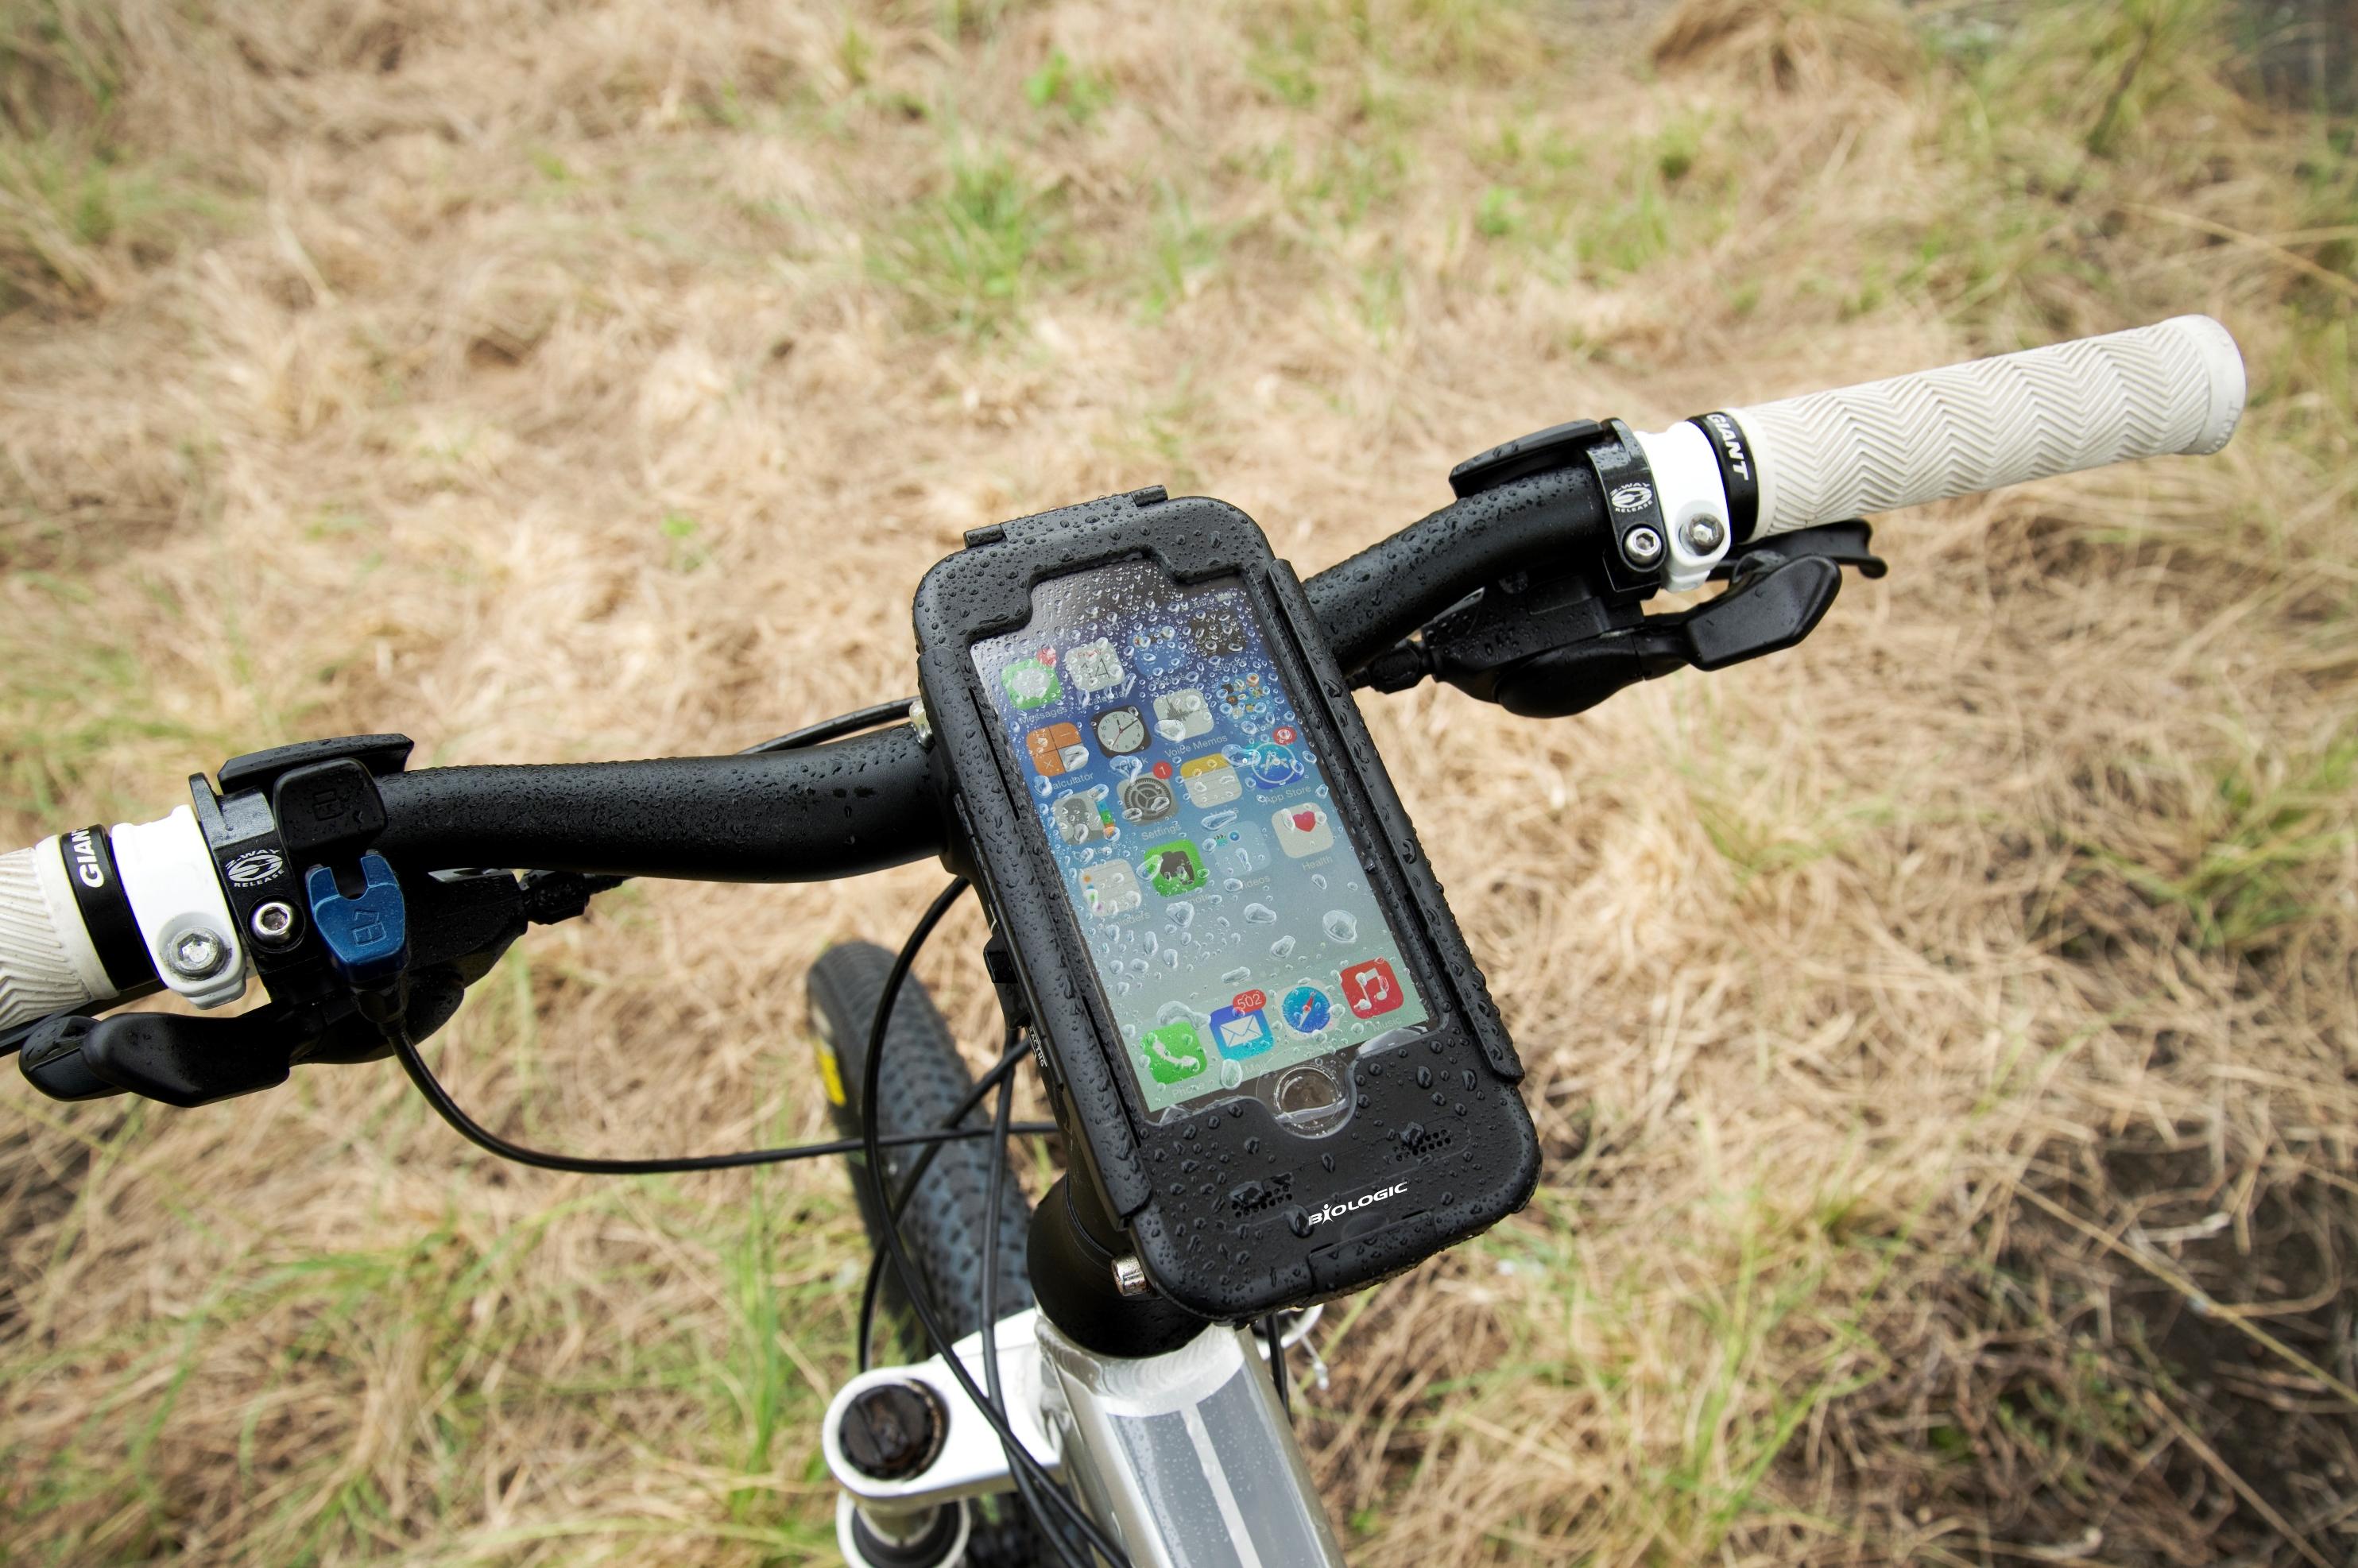 BioLogic bike mount for iPhone 6